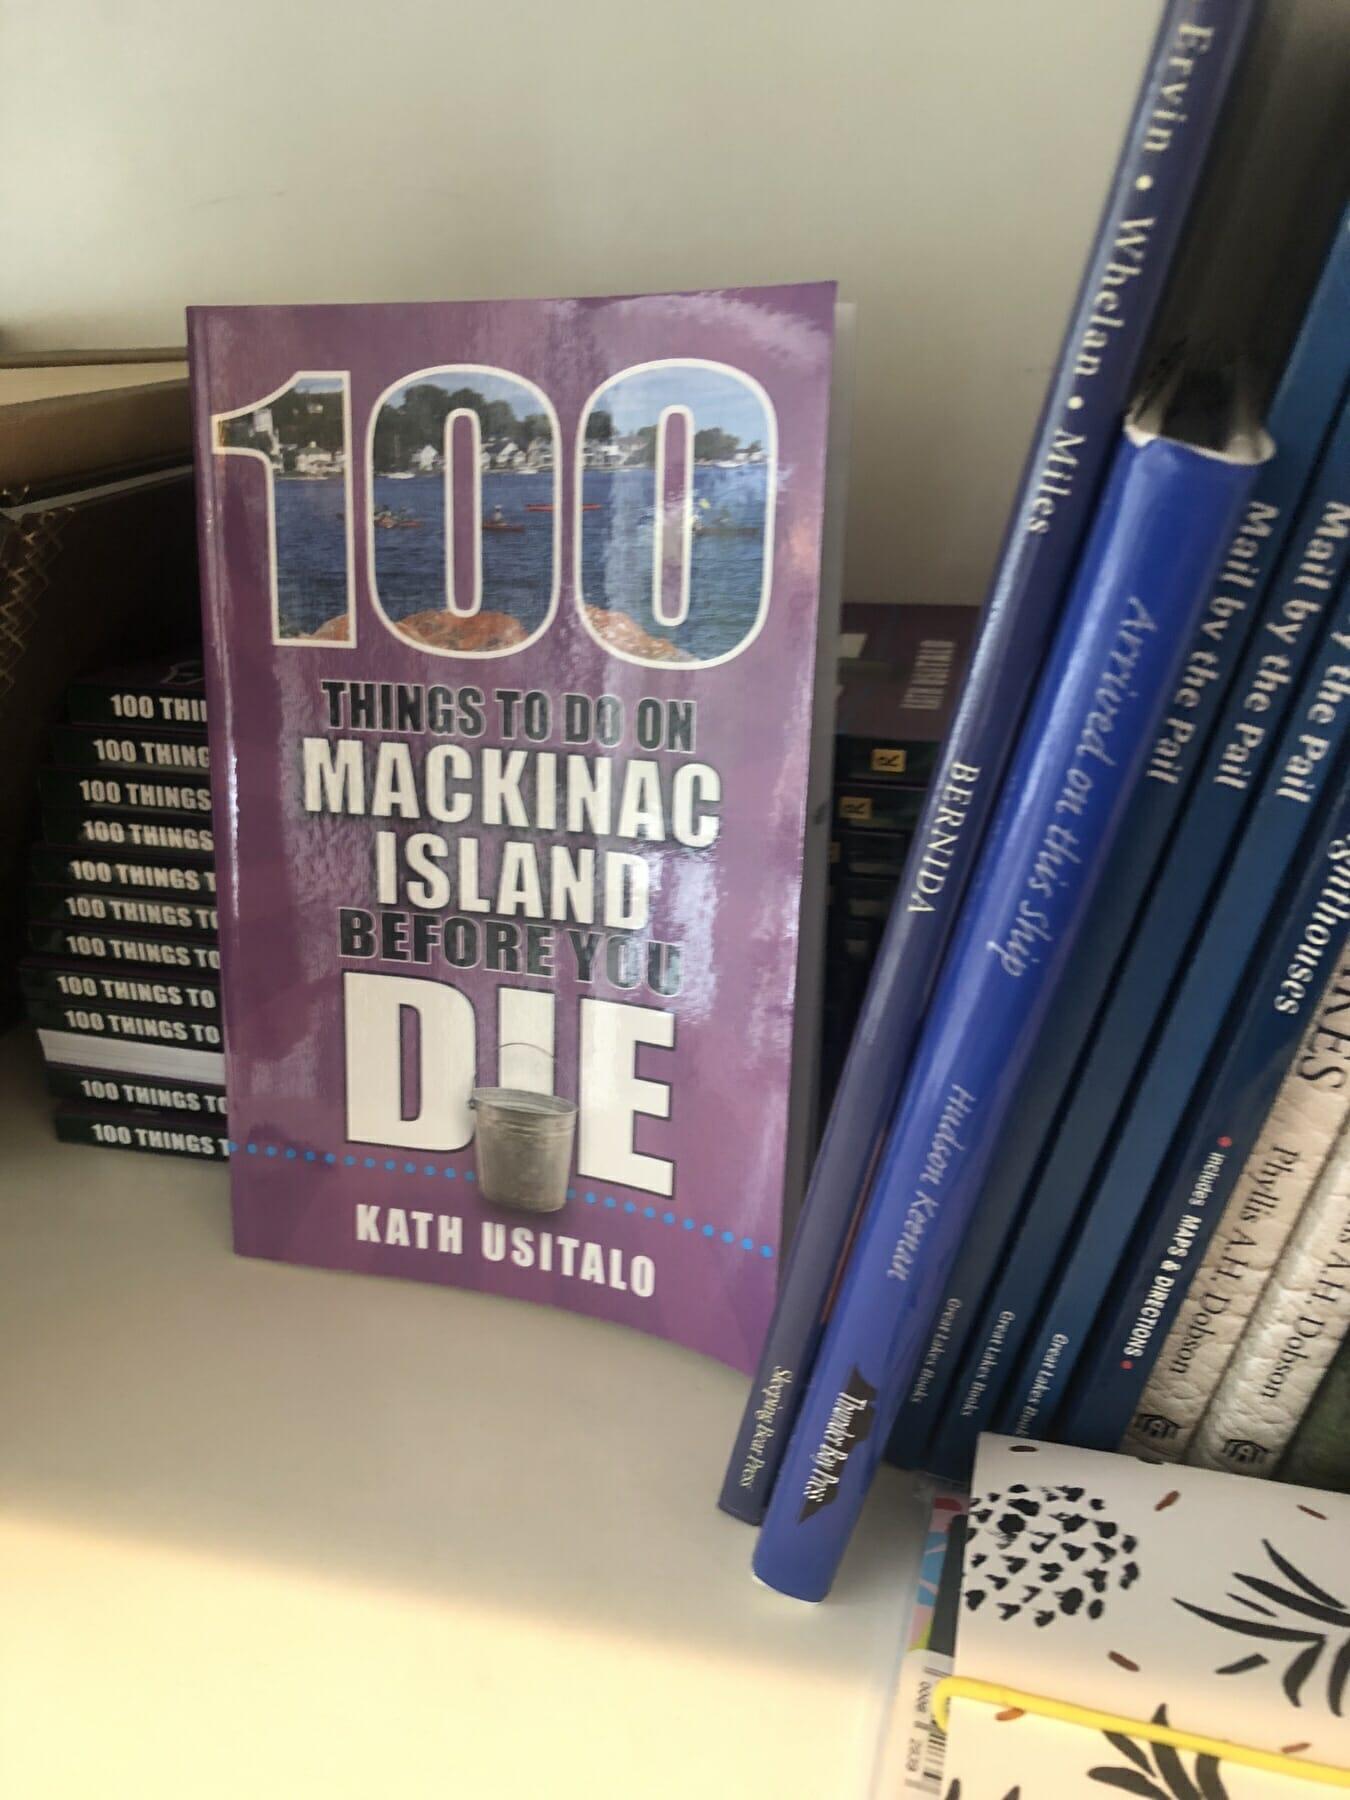 100 Things to do on Mackinac Island